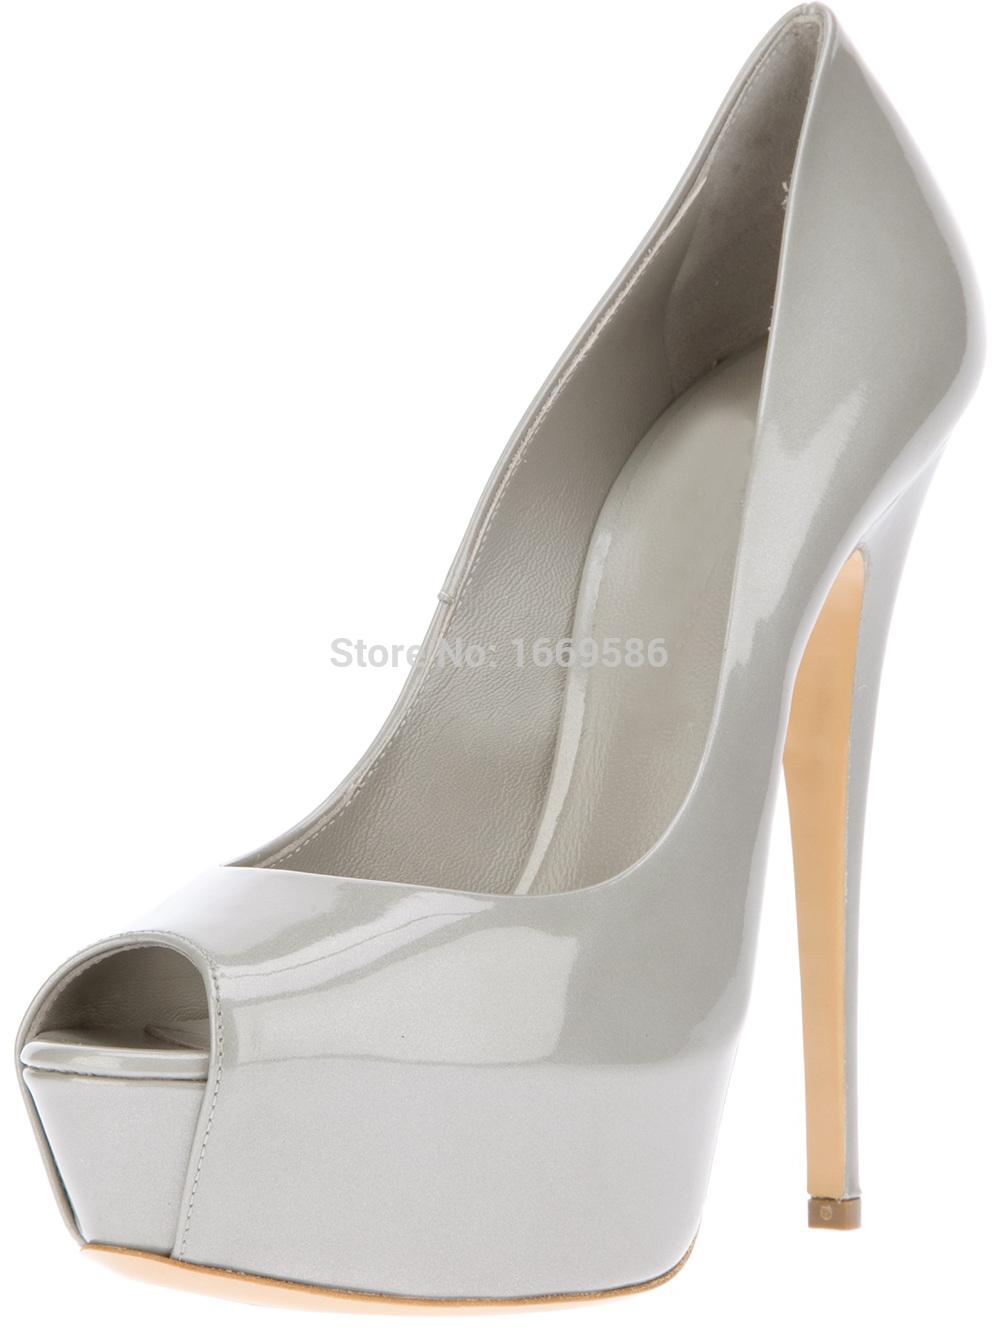 Shoesofdream  Fashion Summer High Custom Basic Peep Pointed Toe Big Size Slip On Shoes Design Brand Women Heels 2015<br><br>Aliexpress